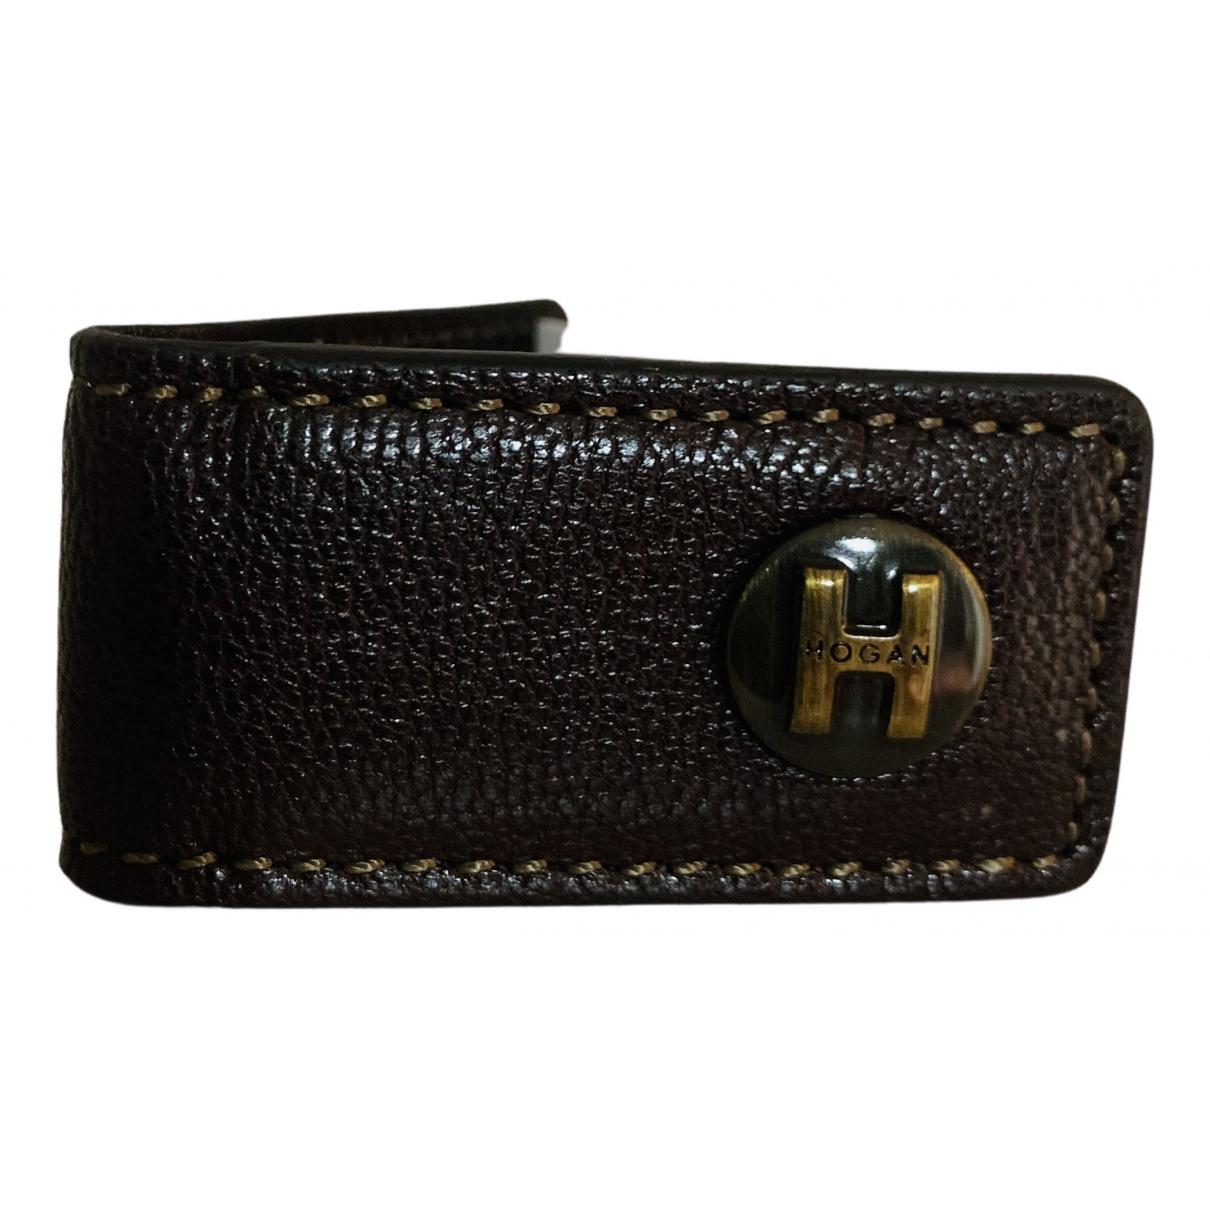 Hogan N Brown Leather Small bag, wallet & cases for Men N